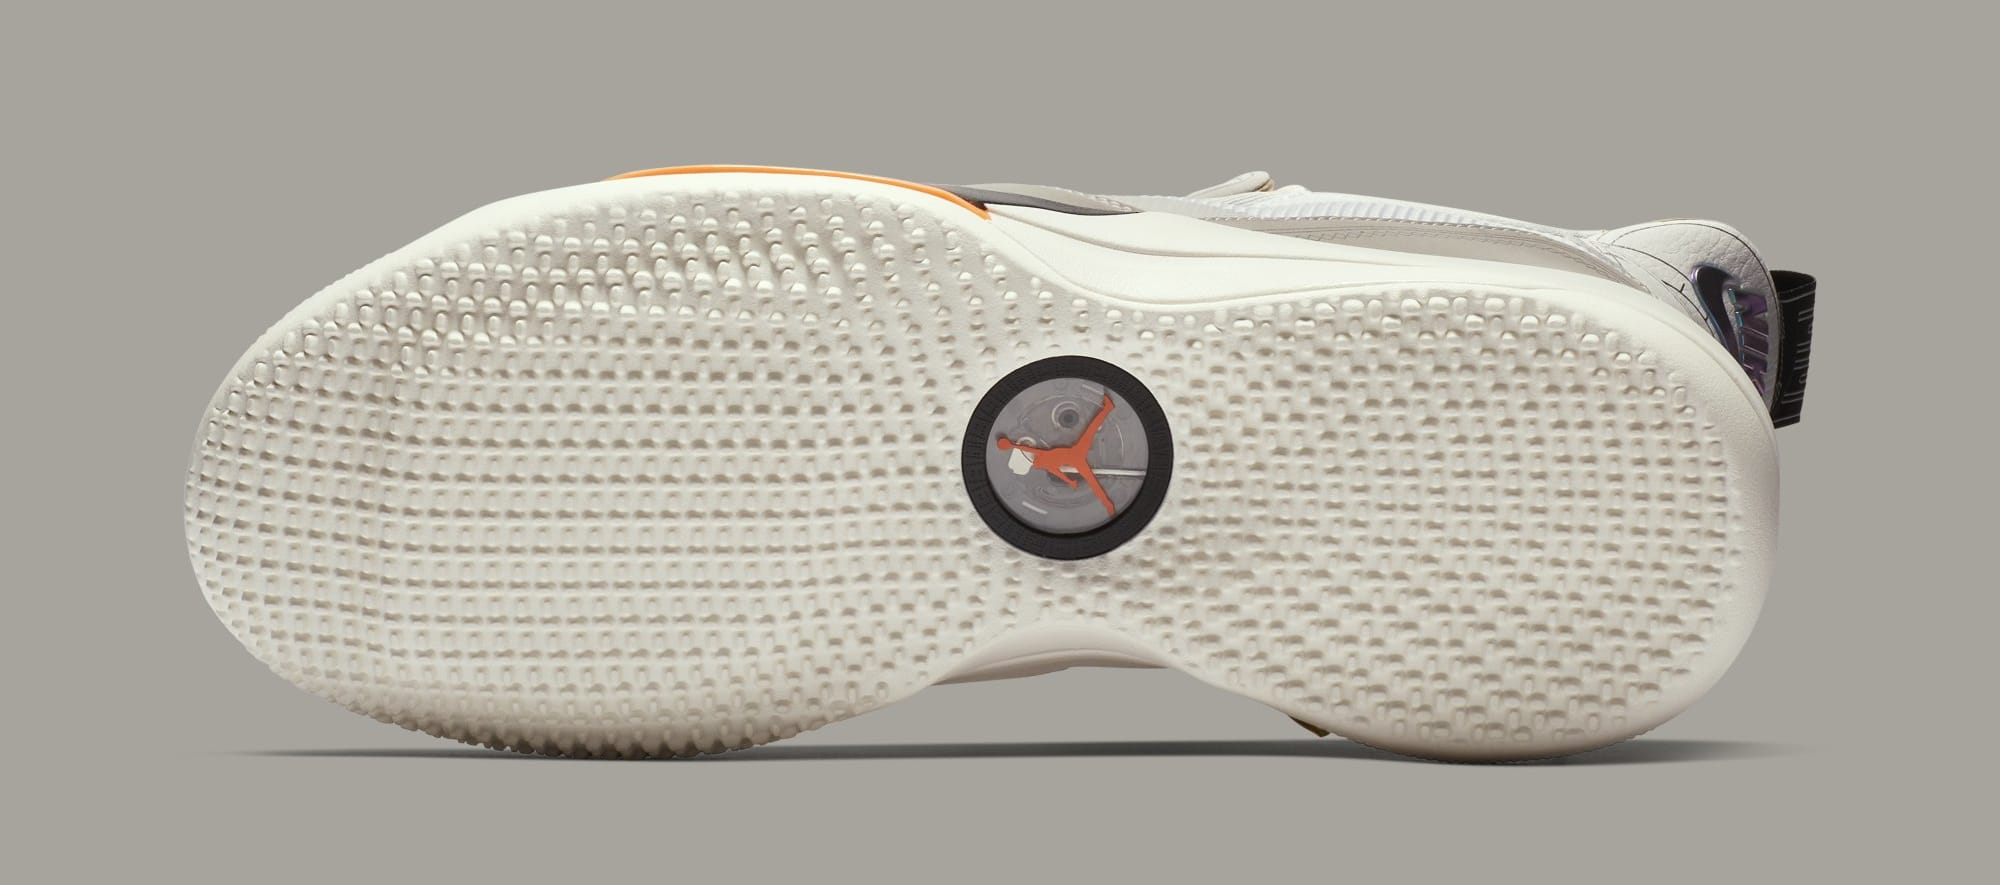 11ebf9ad099d1 Air Jordan 33 'Vast Grey/Cone-Sail-White' AQ8830-004 Release Date | Sole  Collector